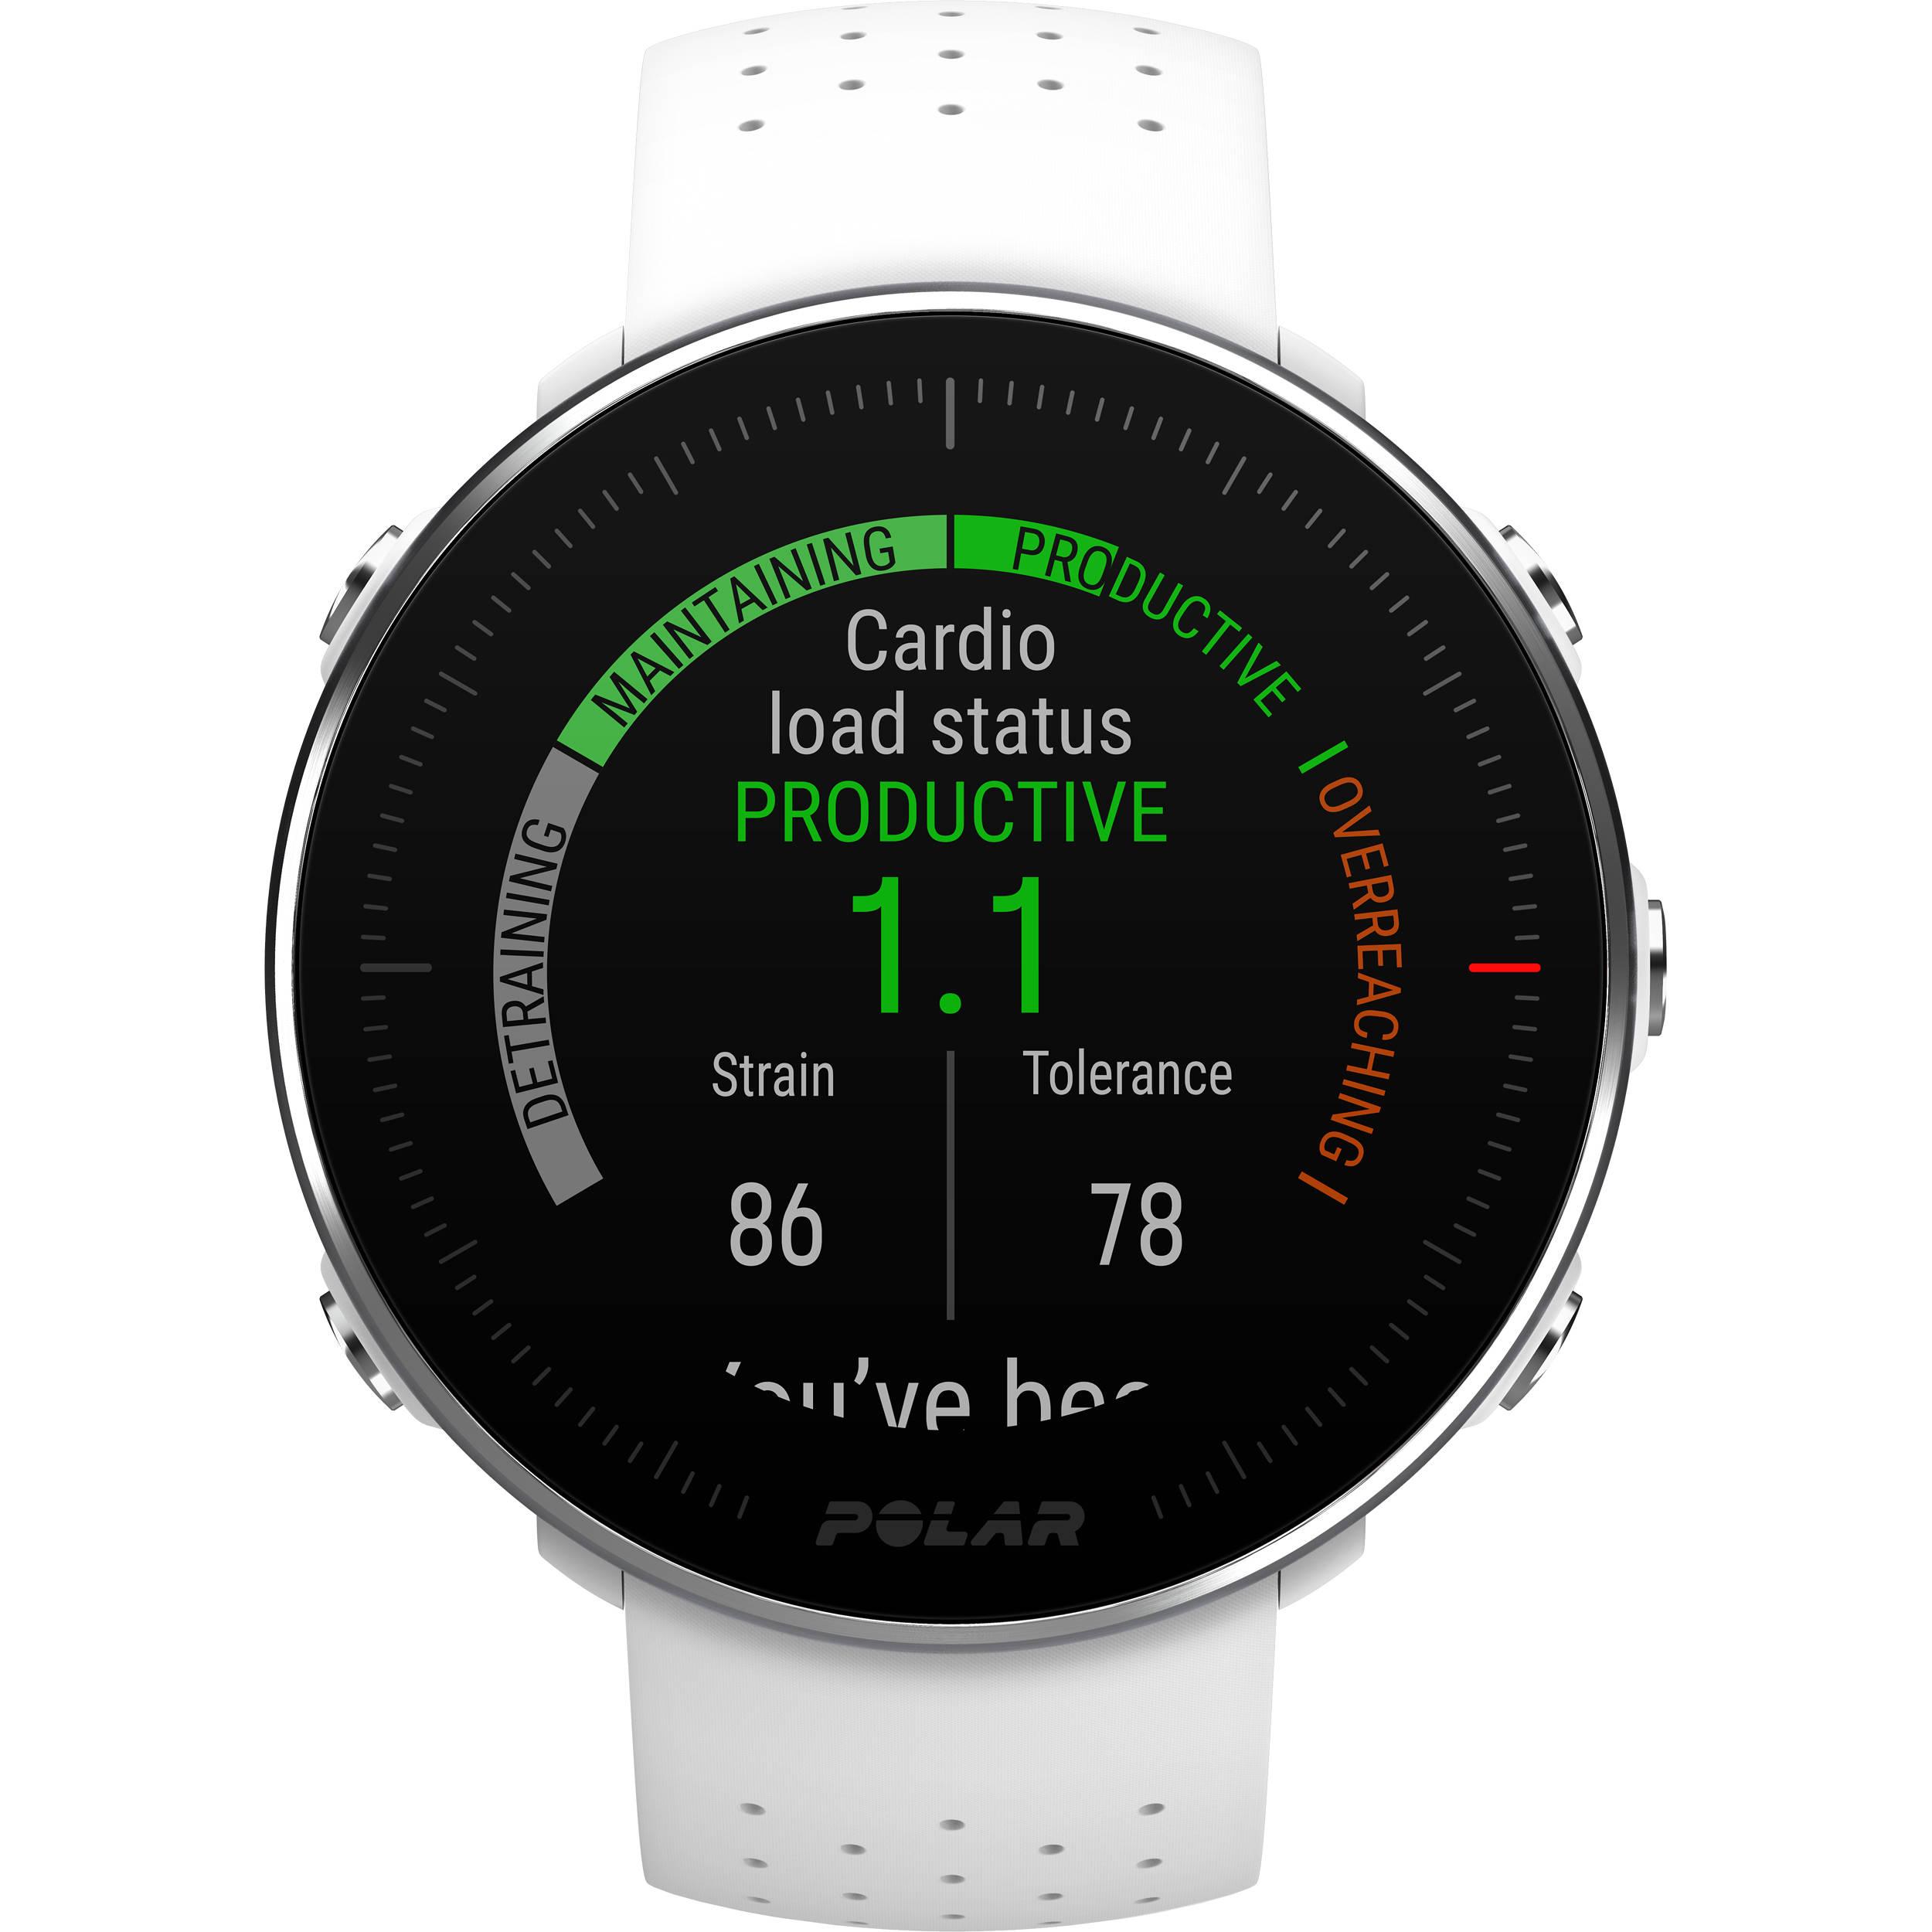 502c48f4496 Polar Vantage M Multisport & Running GPS Watch (Small/Medium, White)